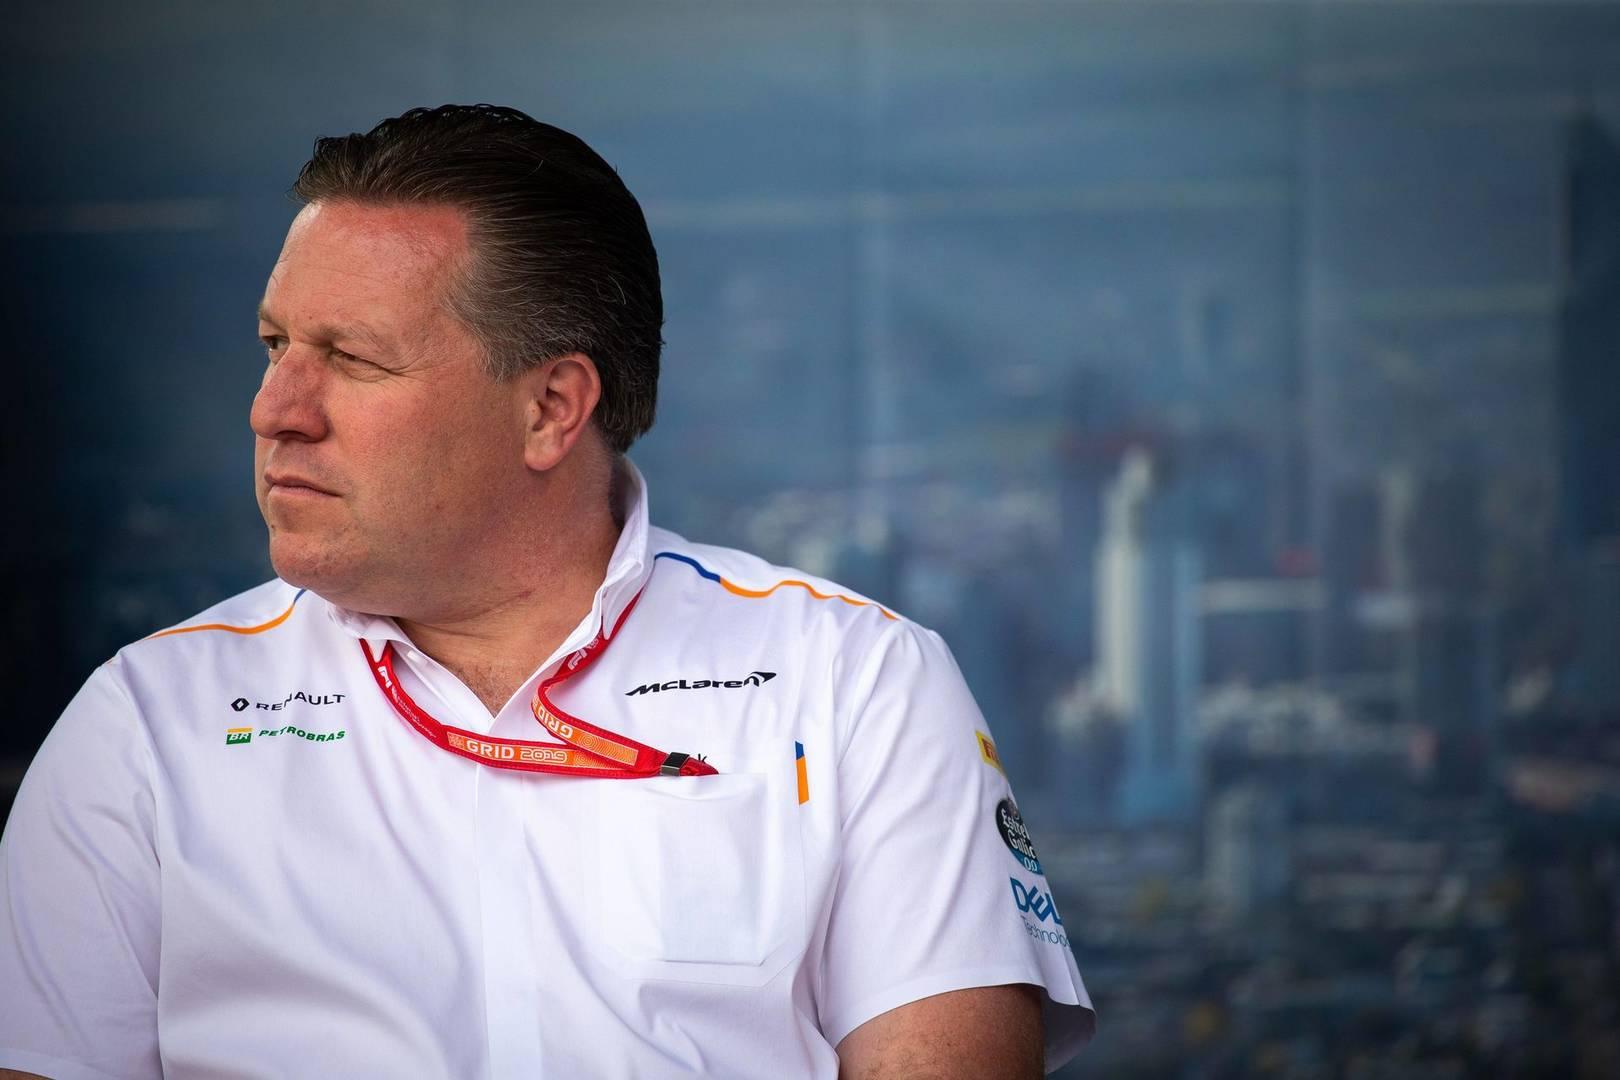 McLaren evalúa su ingreso a la Fórmula E a partir de 2023; afirma Zak Brown